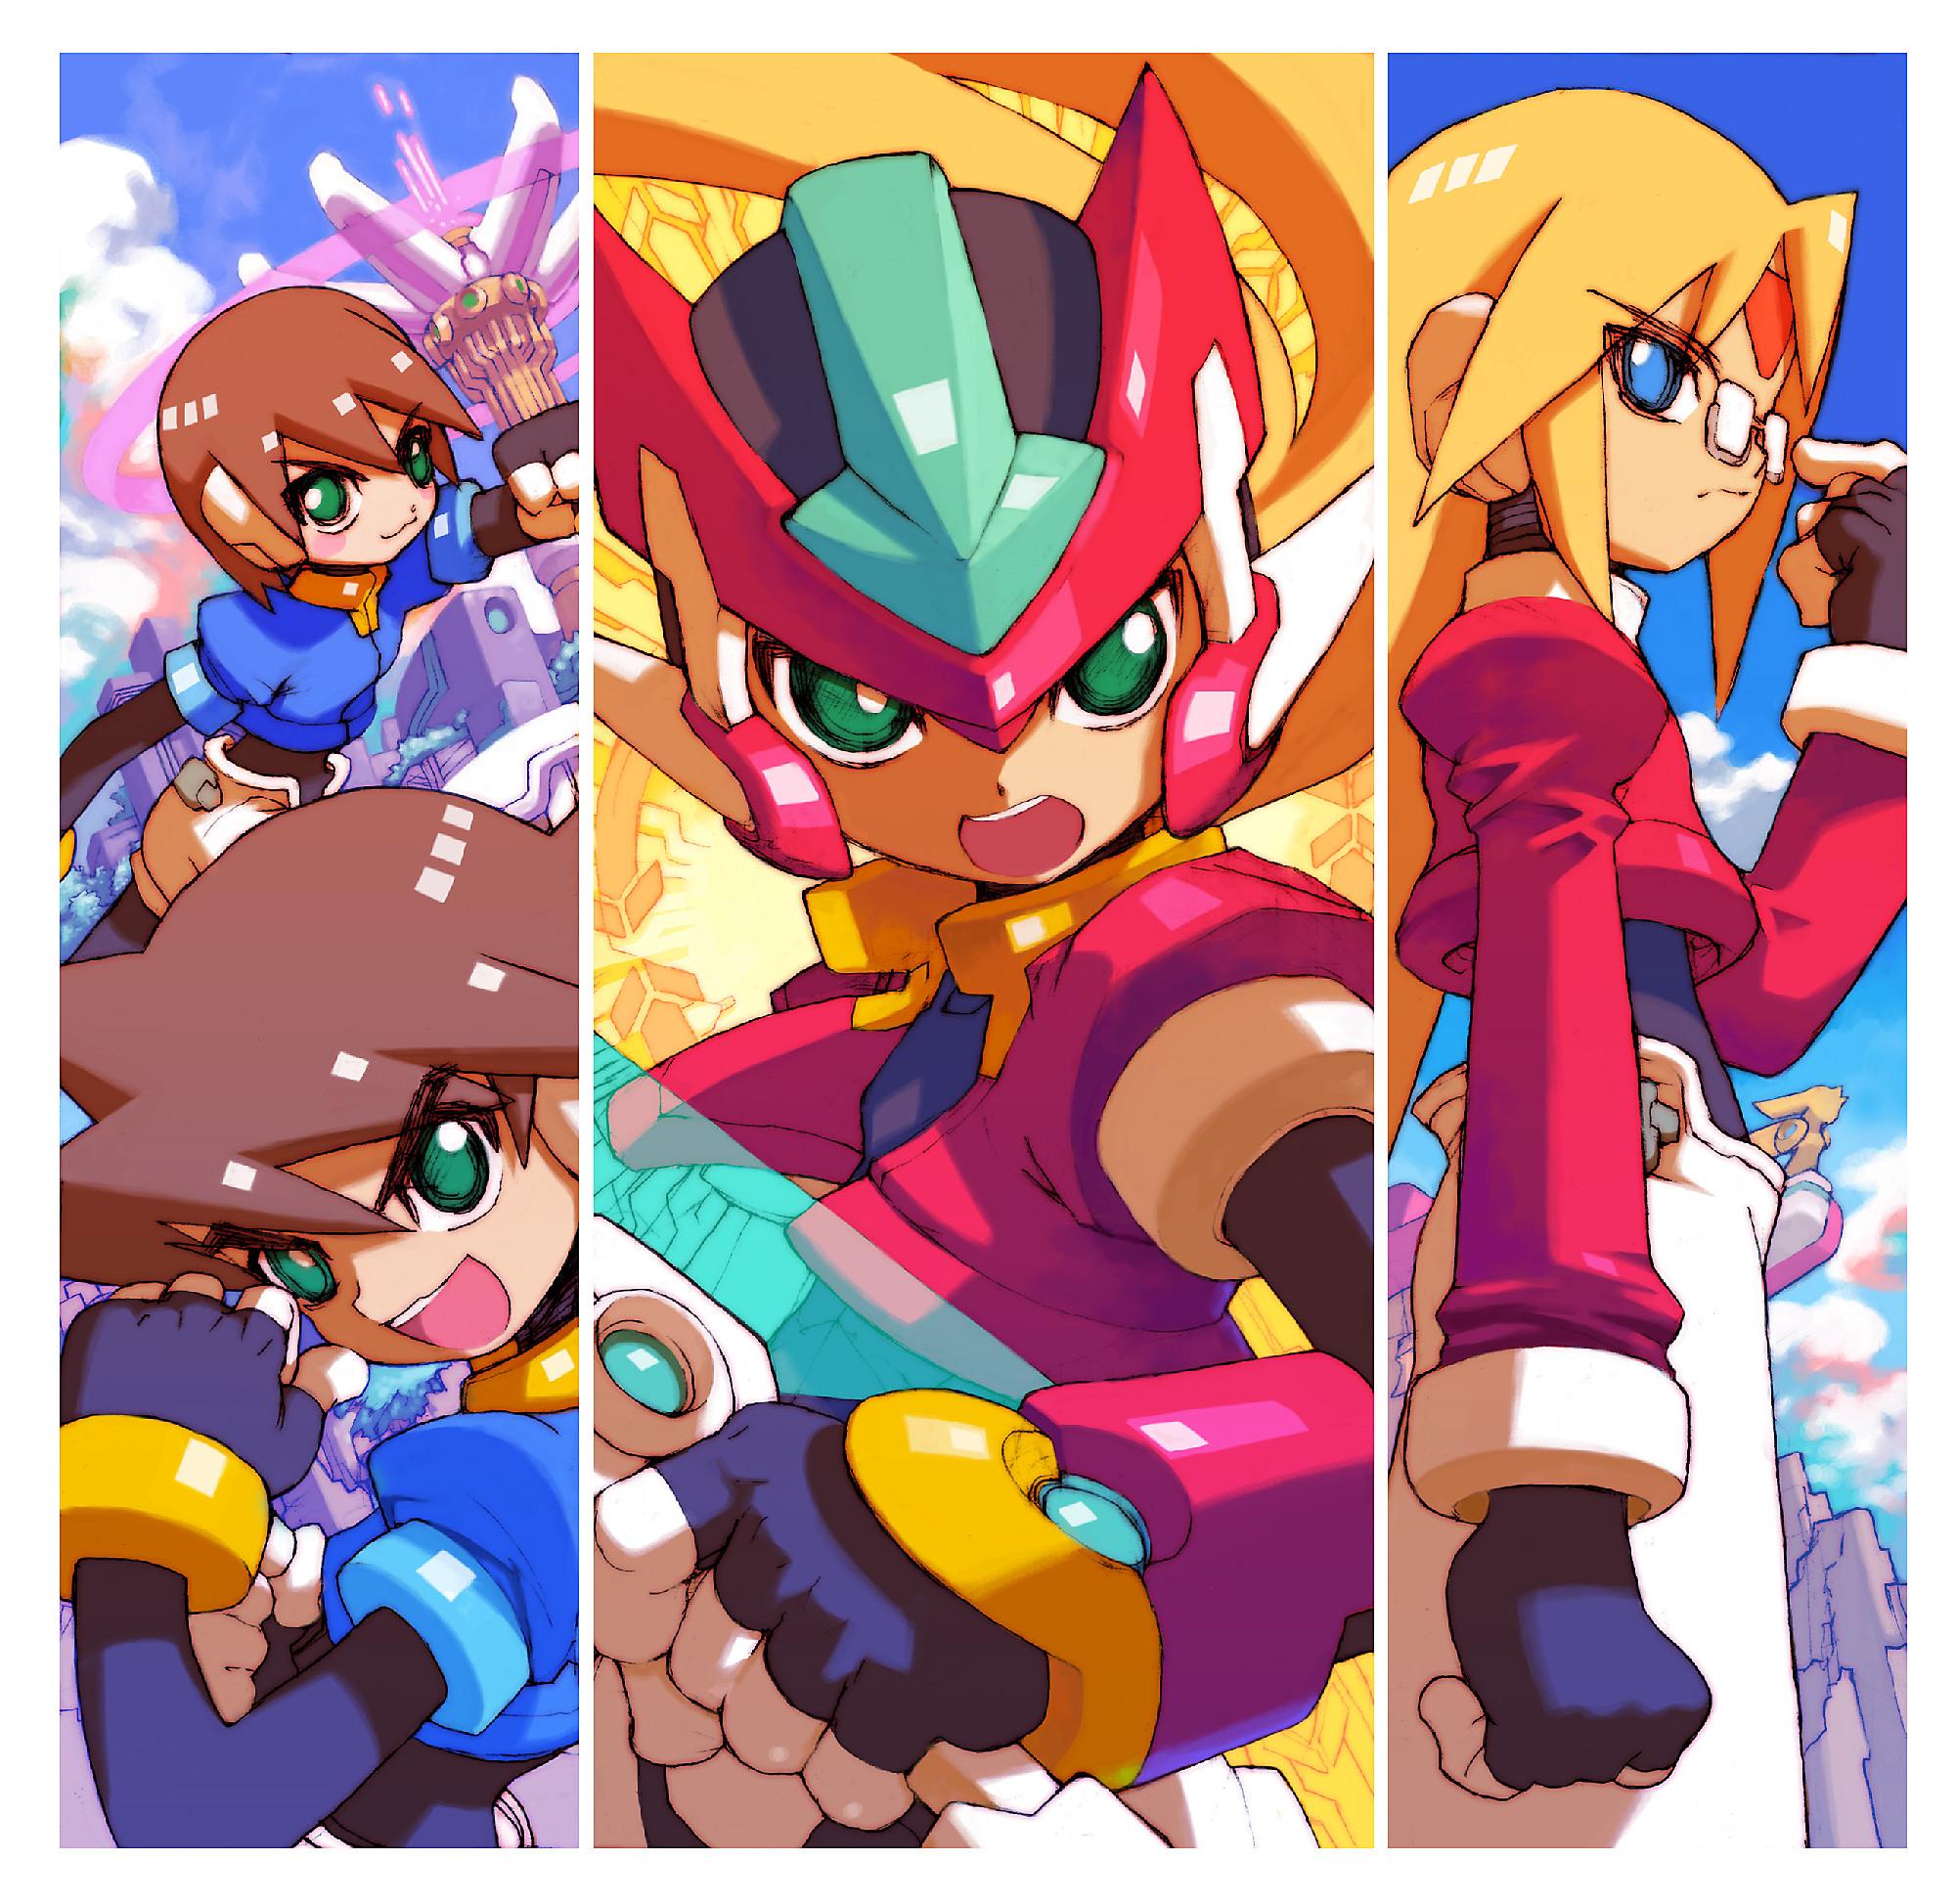 Megaman zx for Megaman 9 portada